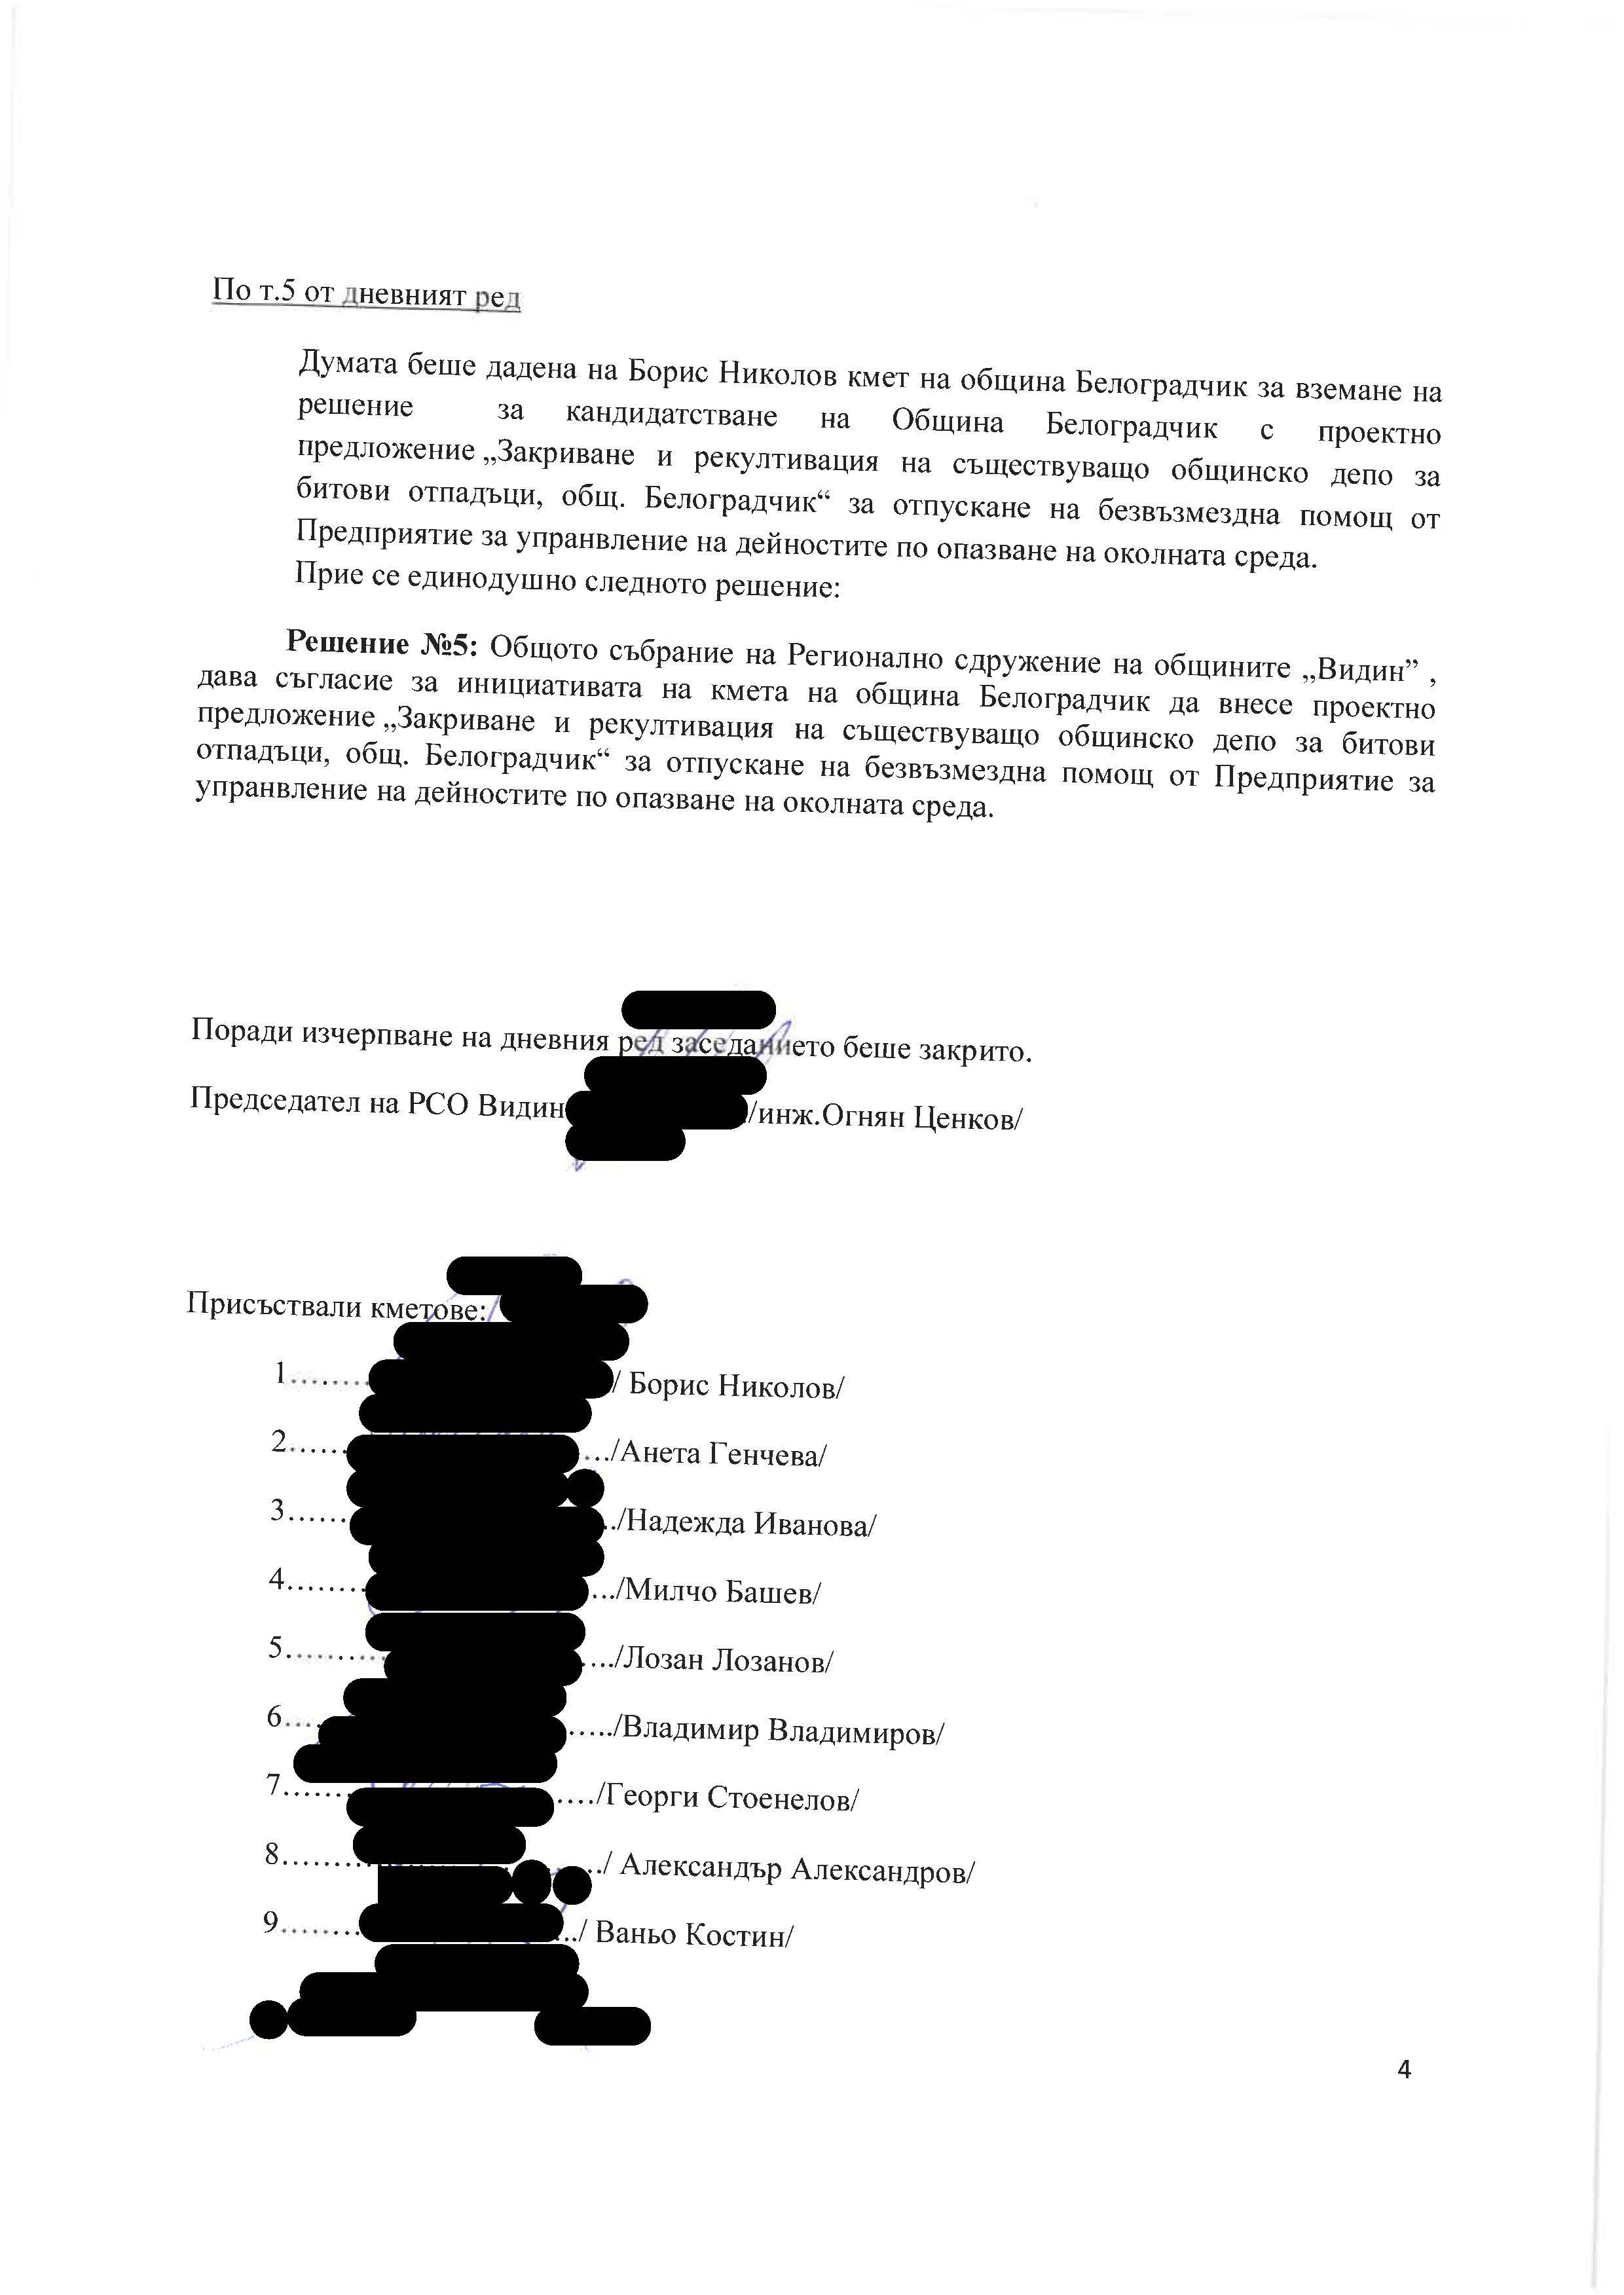 Протокол № 1 от 27.03.2018_Page_4